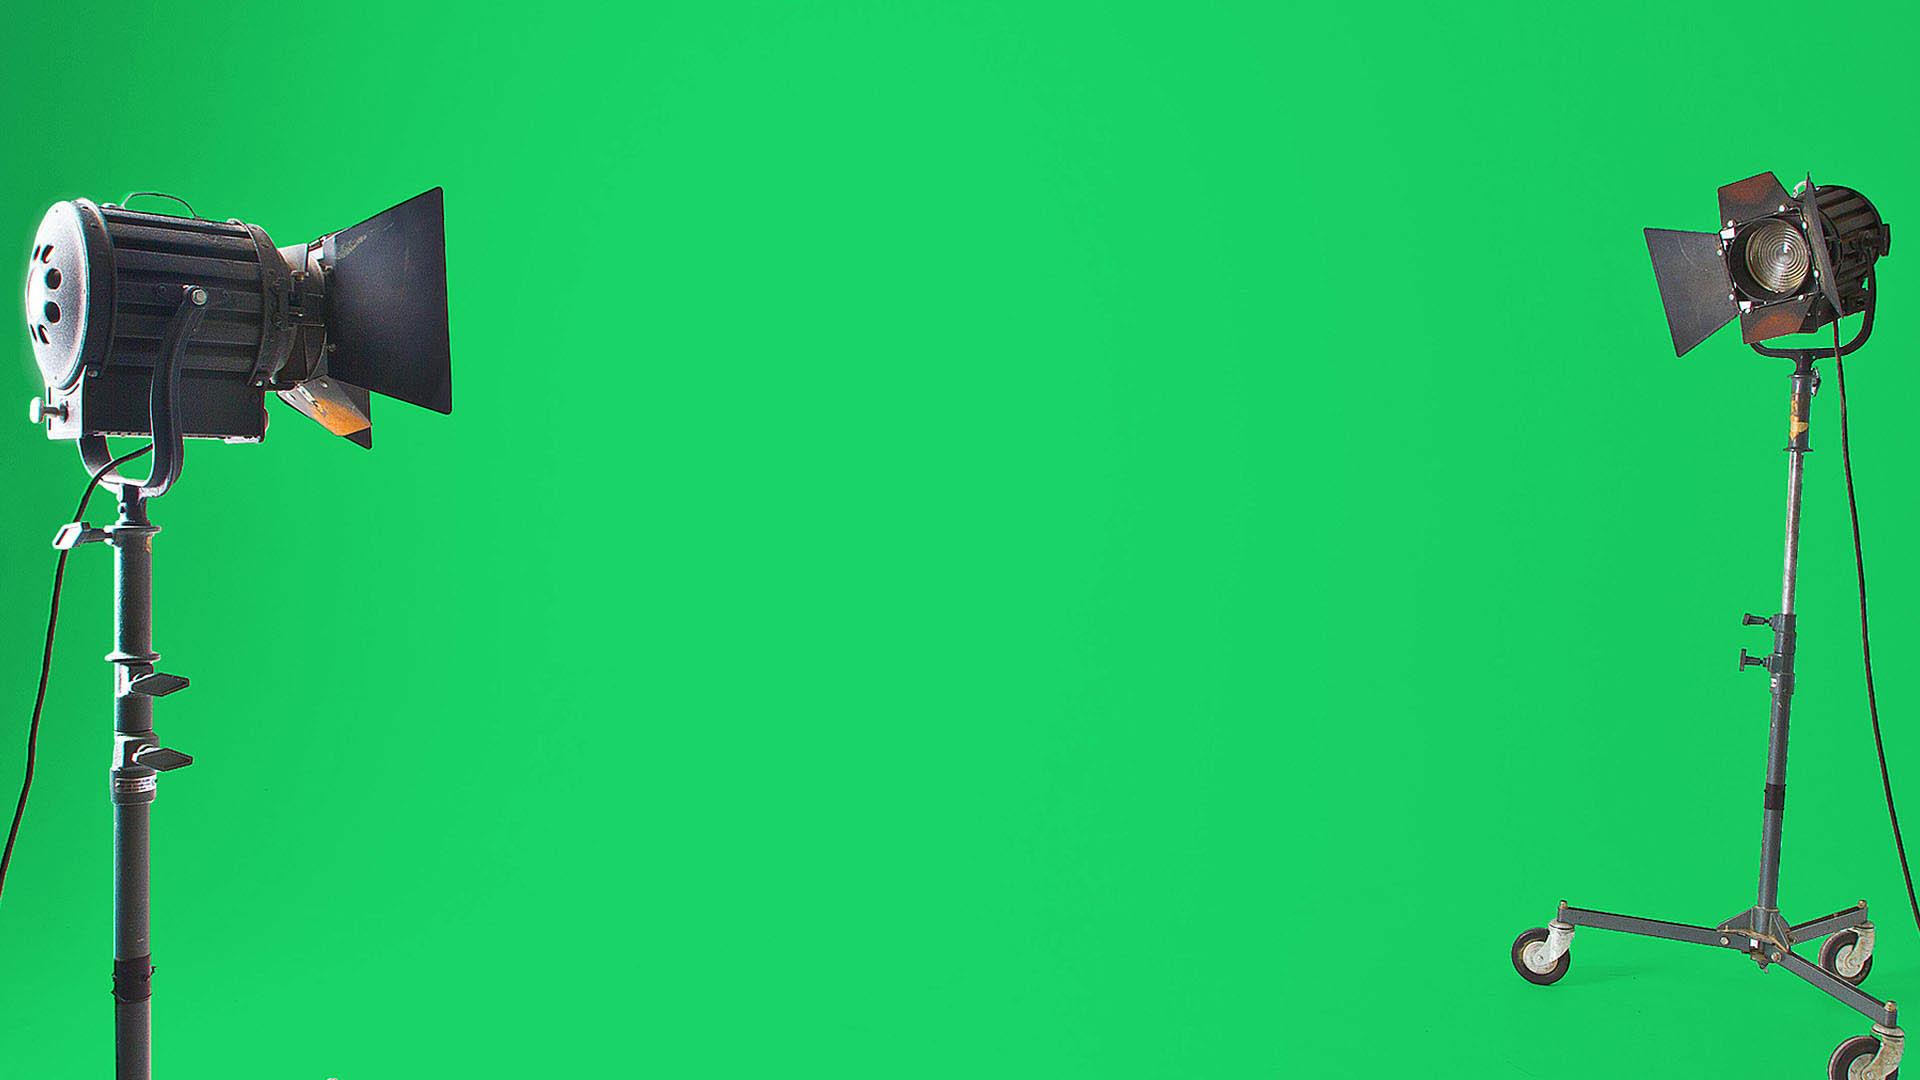 Best Green Screen Light Kits - Best Sellers of 2019